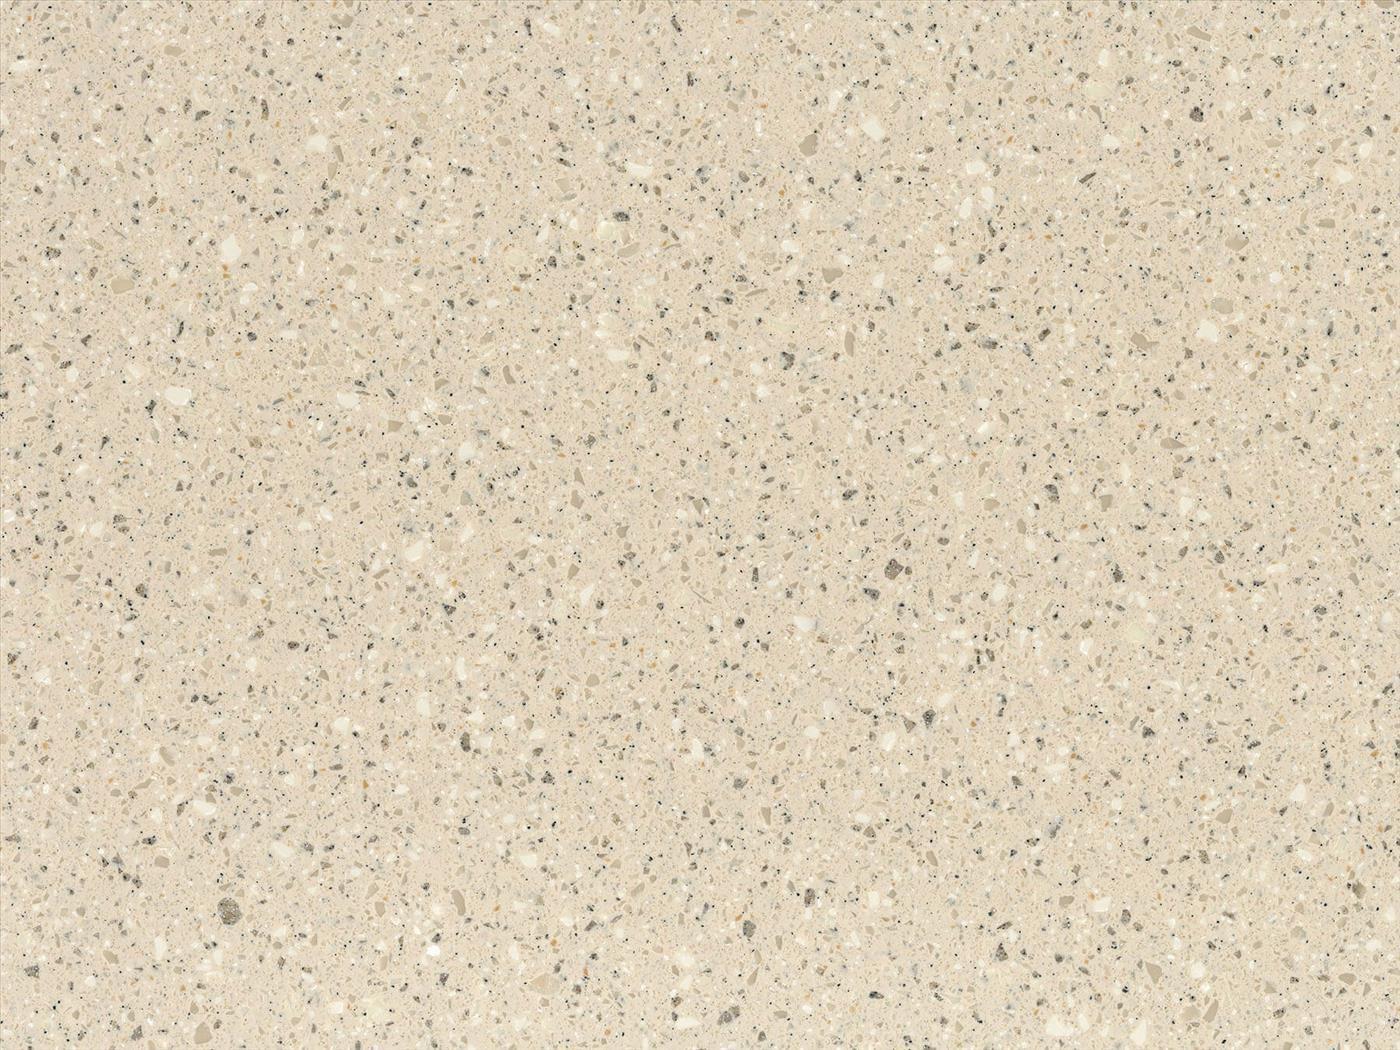 קוריאן fossil